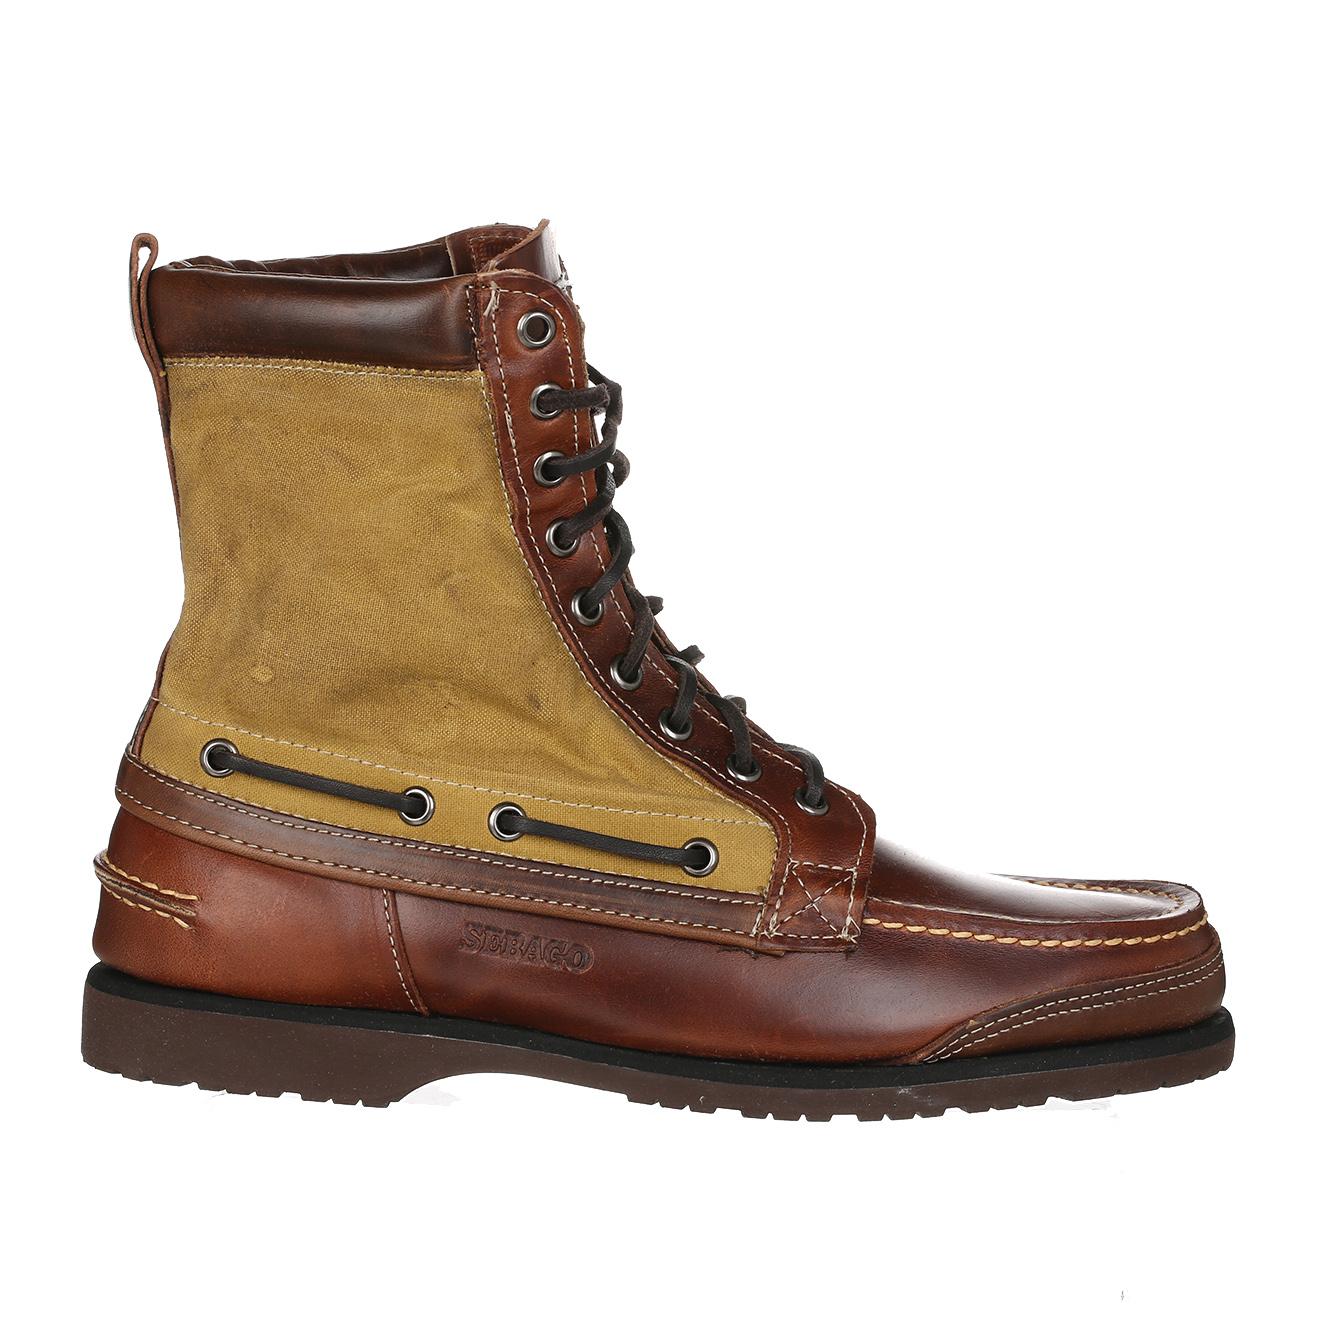 Chaussures Bateau montantes en Cuir & Toile Osmore marron/beige - Sebago - Modalova